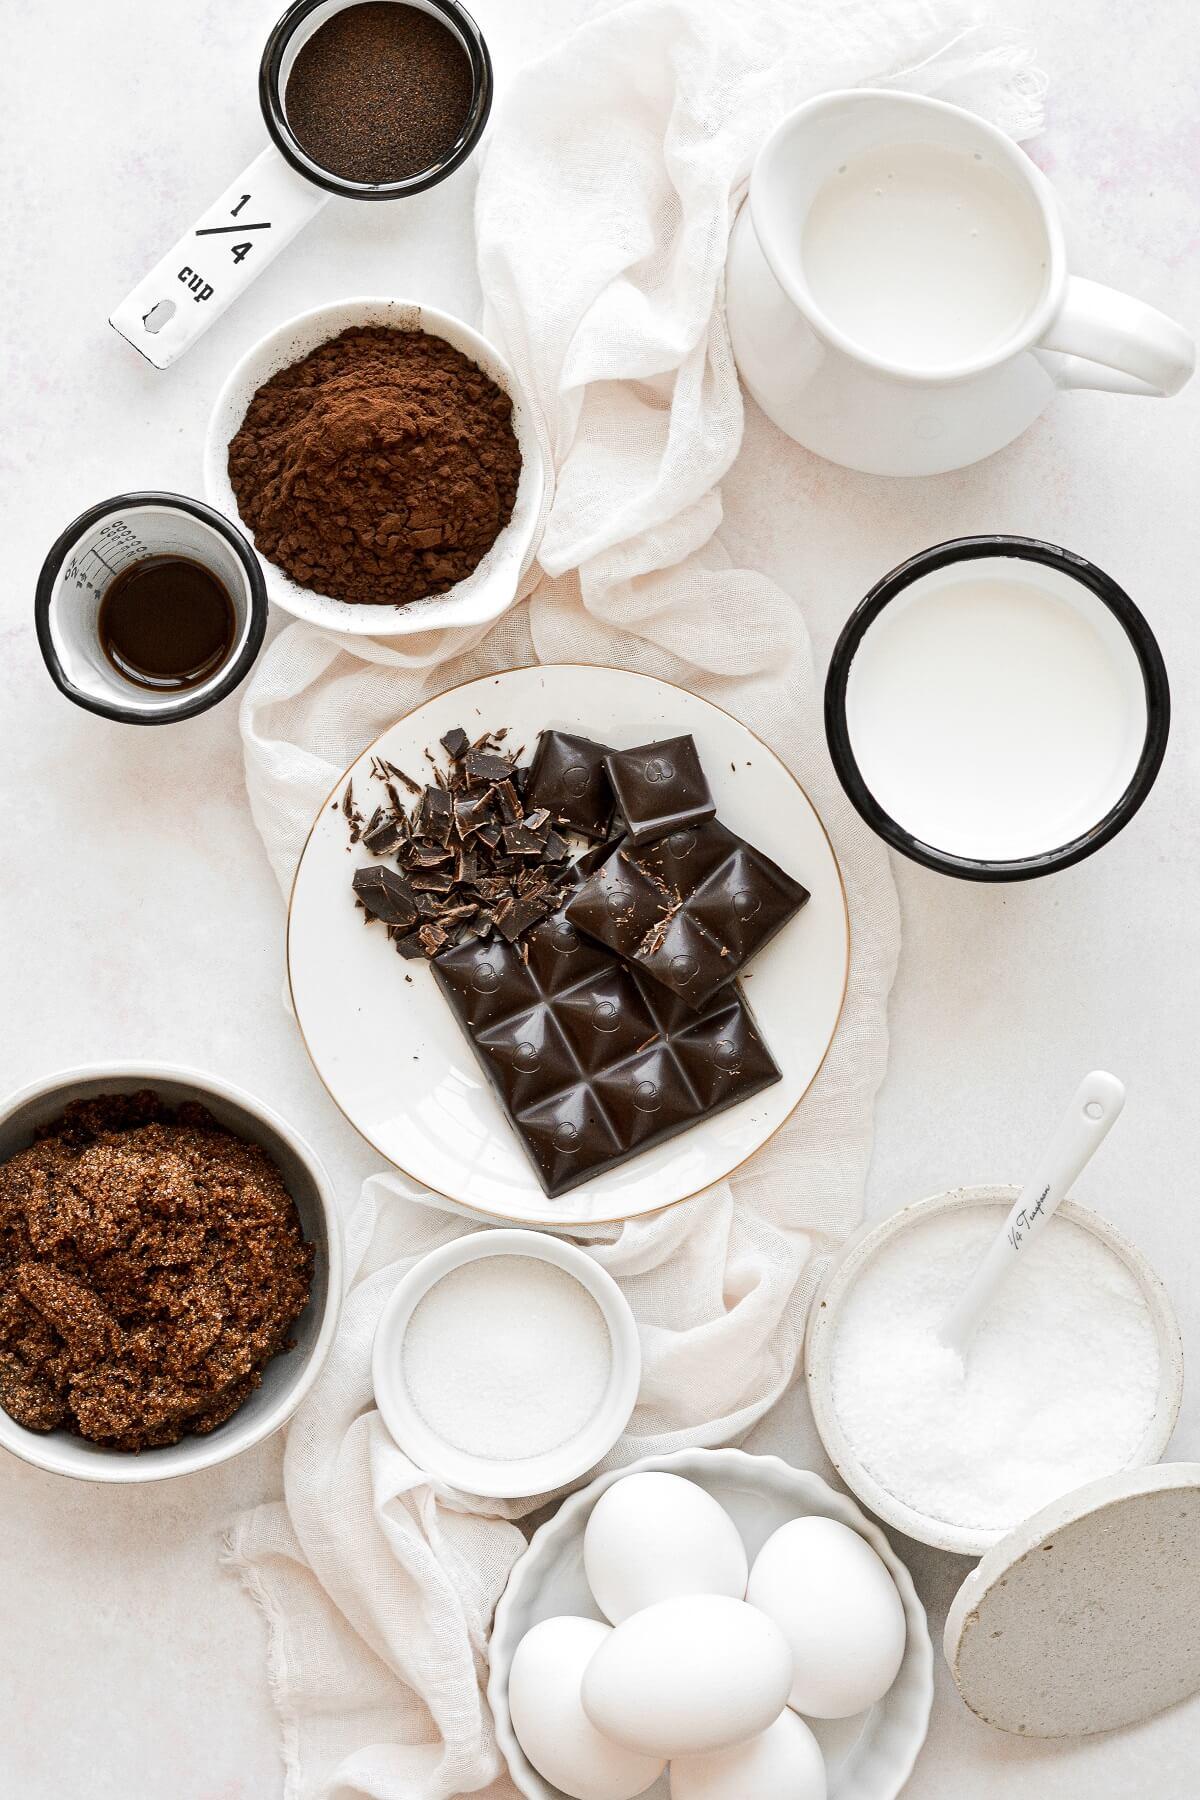 Ingredients for dark chocolate ice cream.